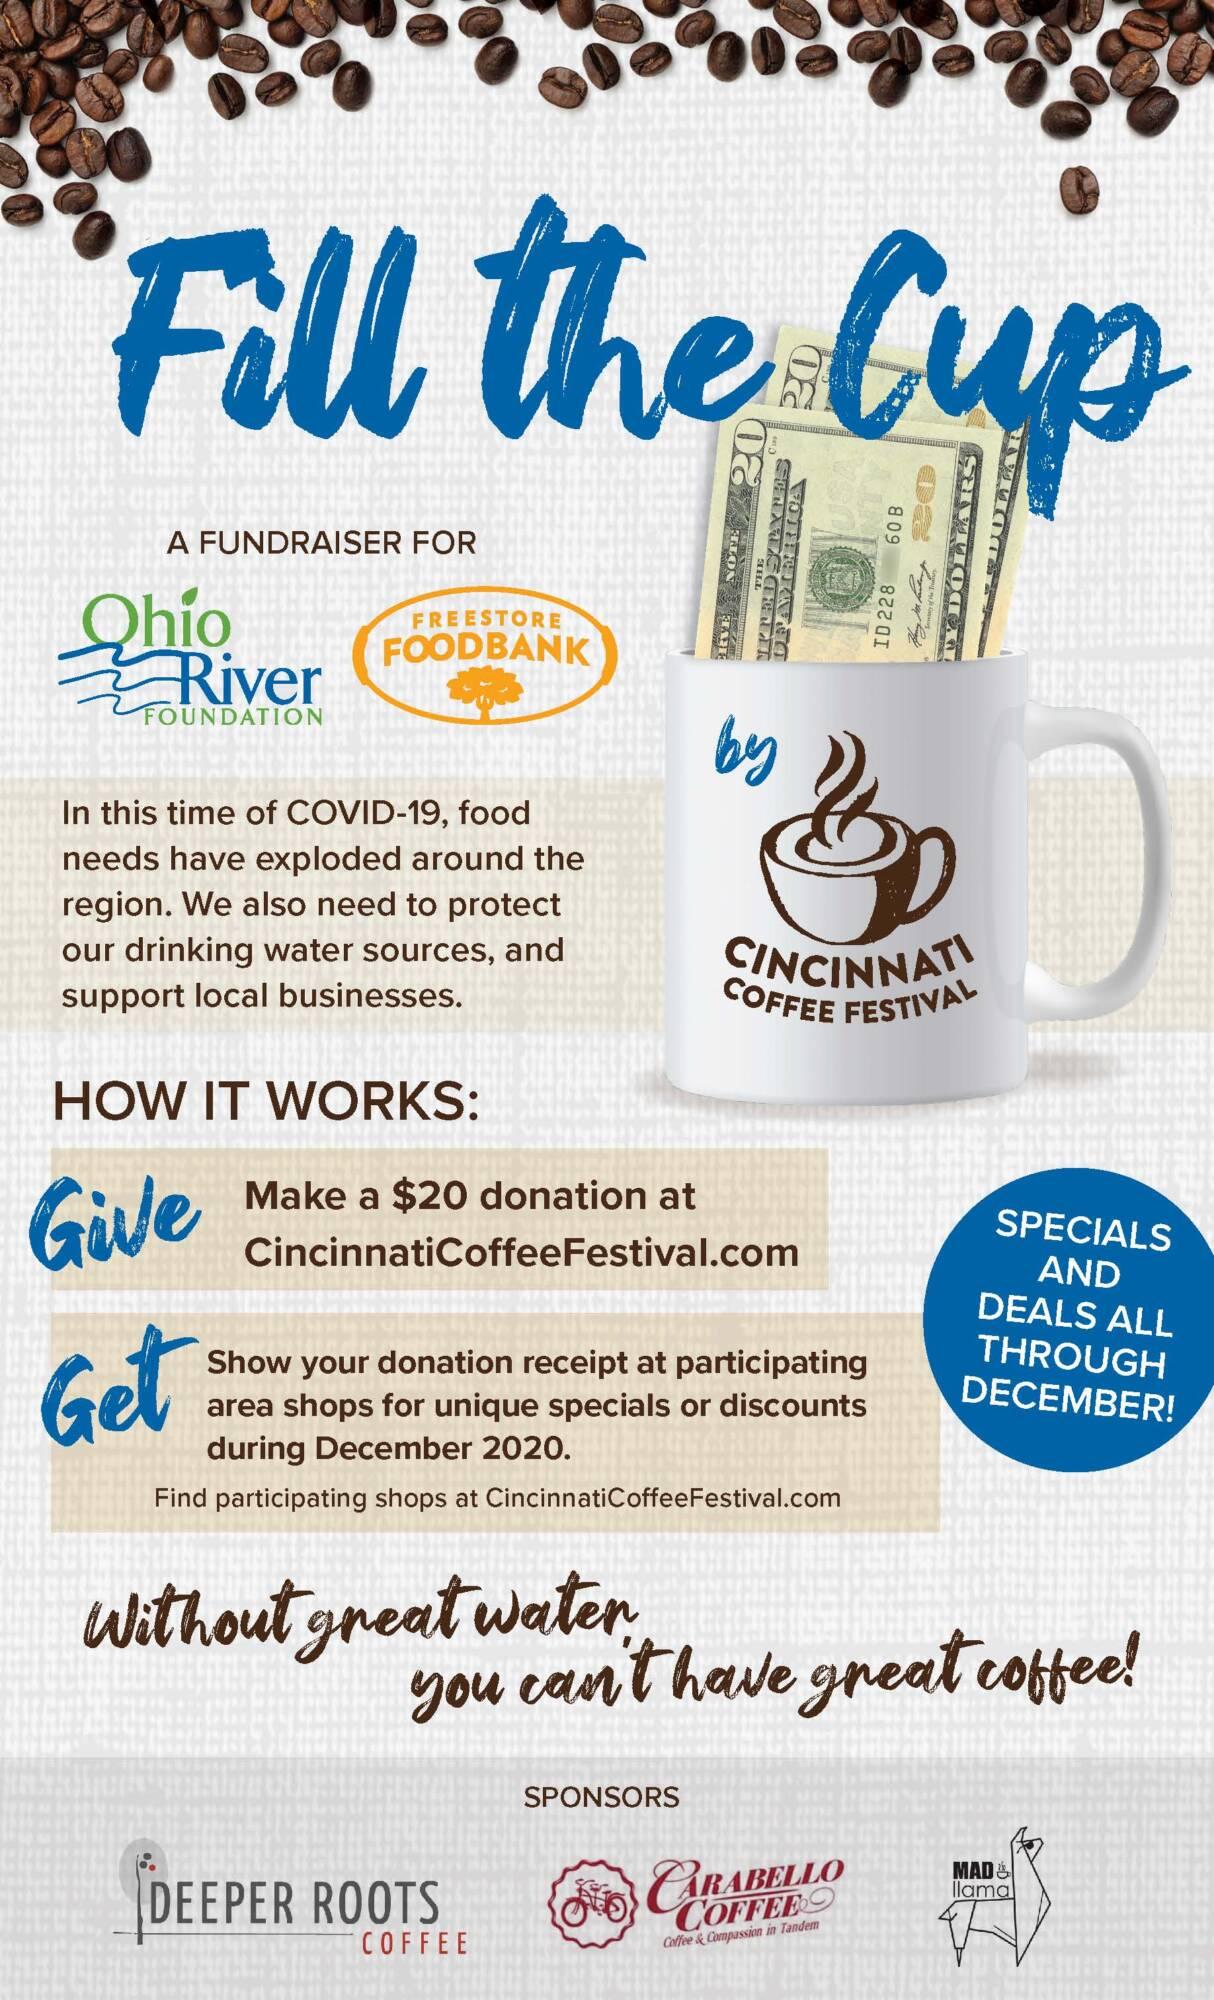 Cincinnati Coffee Festival to 'Fill the Cup'